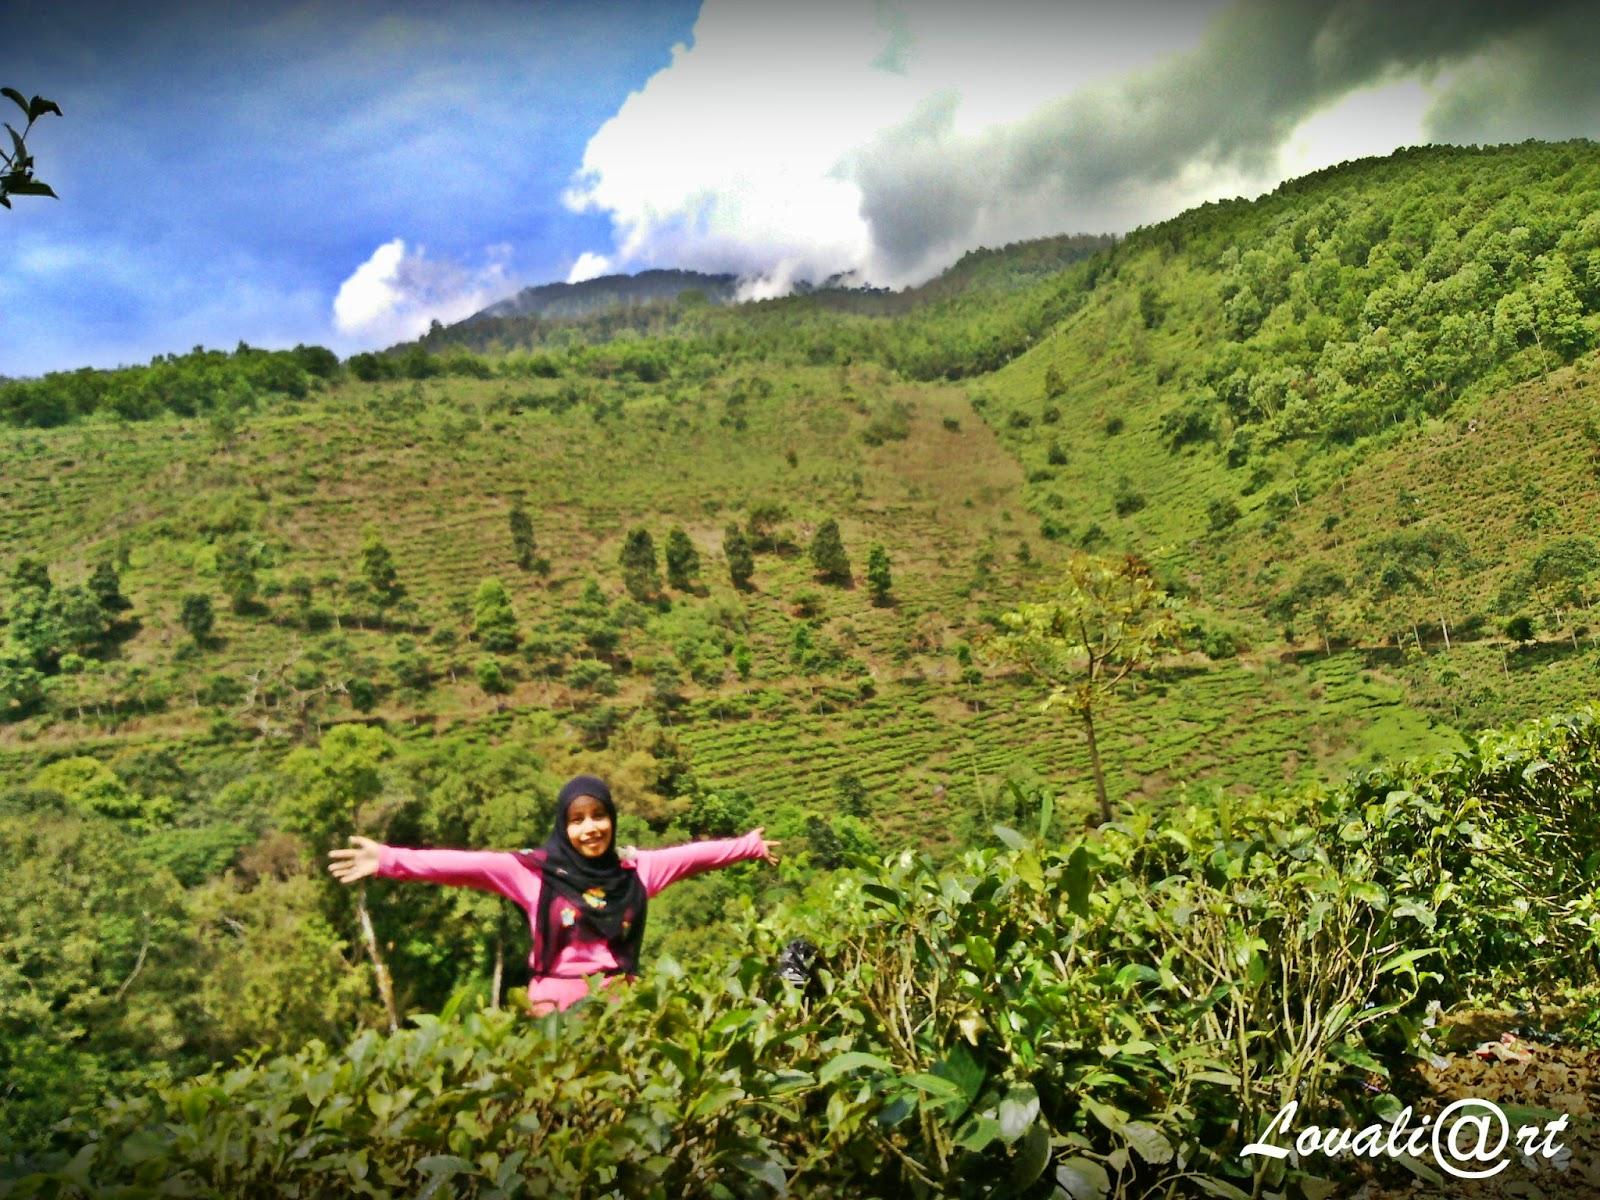 Mei 2014 Cakra Baymax Tourism Wisata Jawa Timur Borobudur Kebun